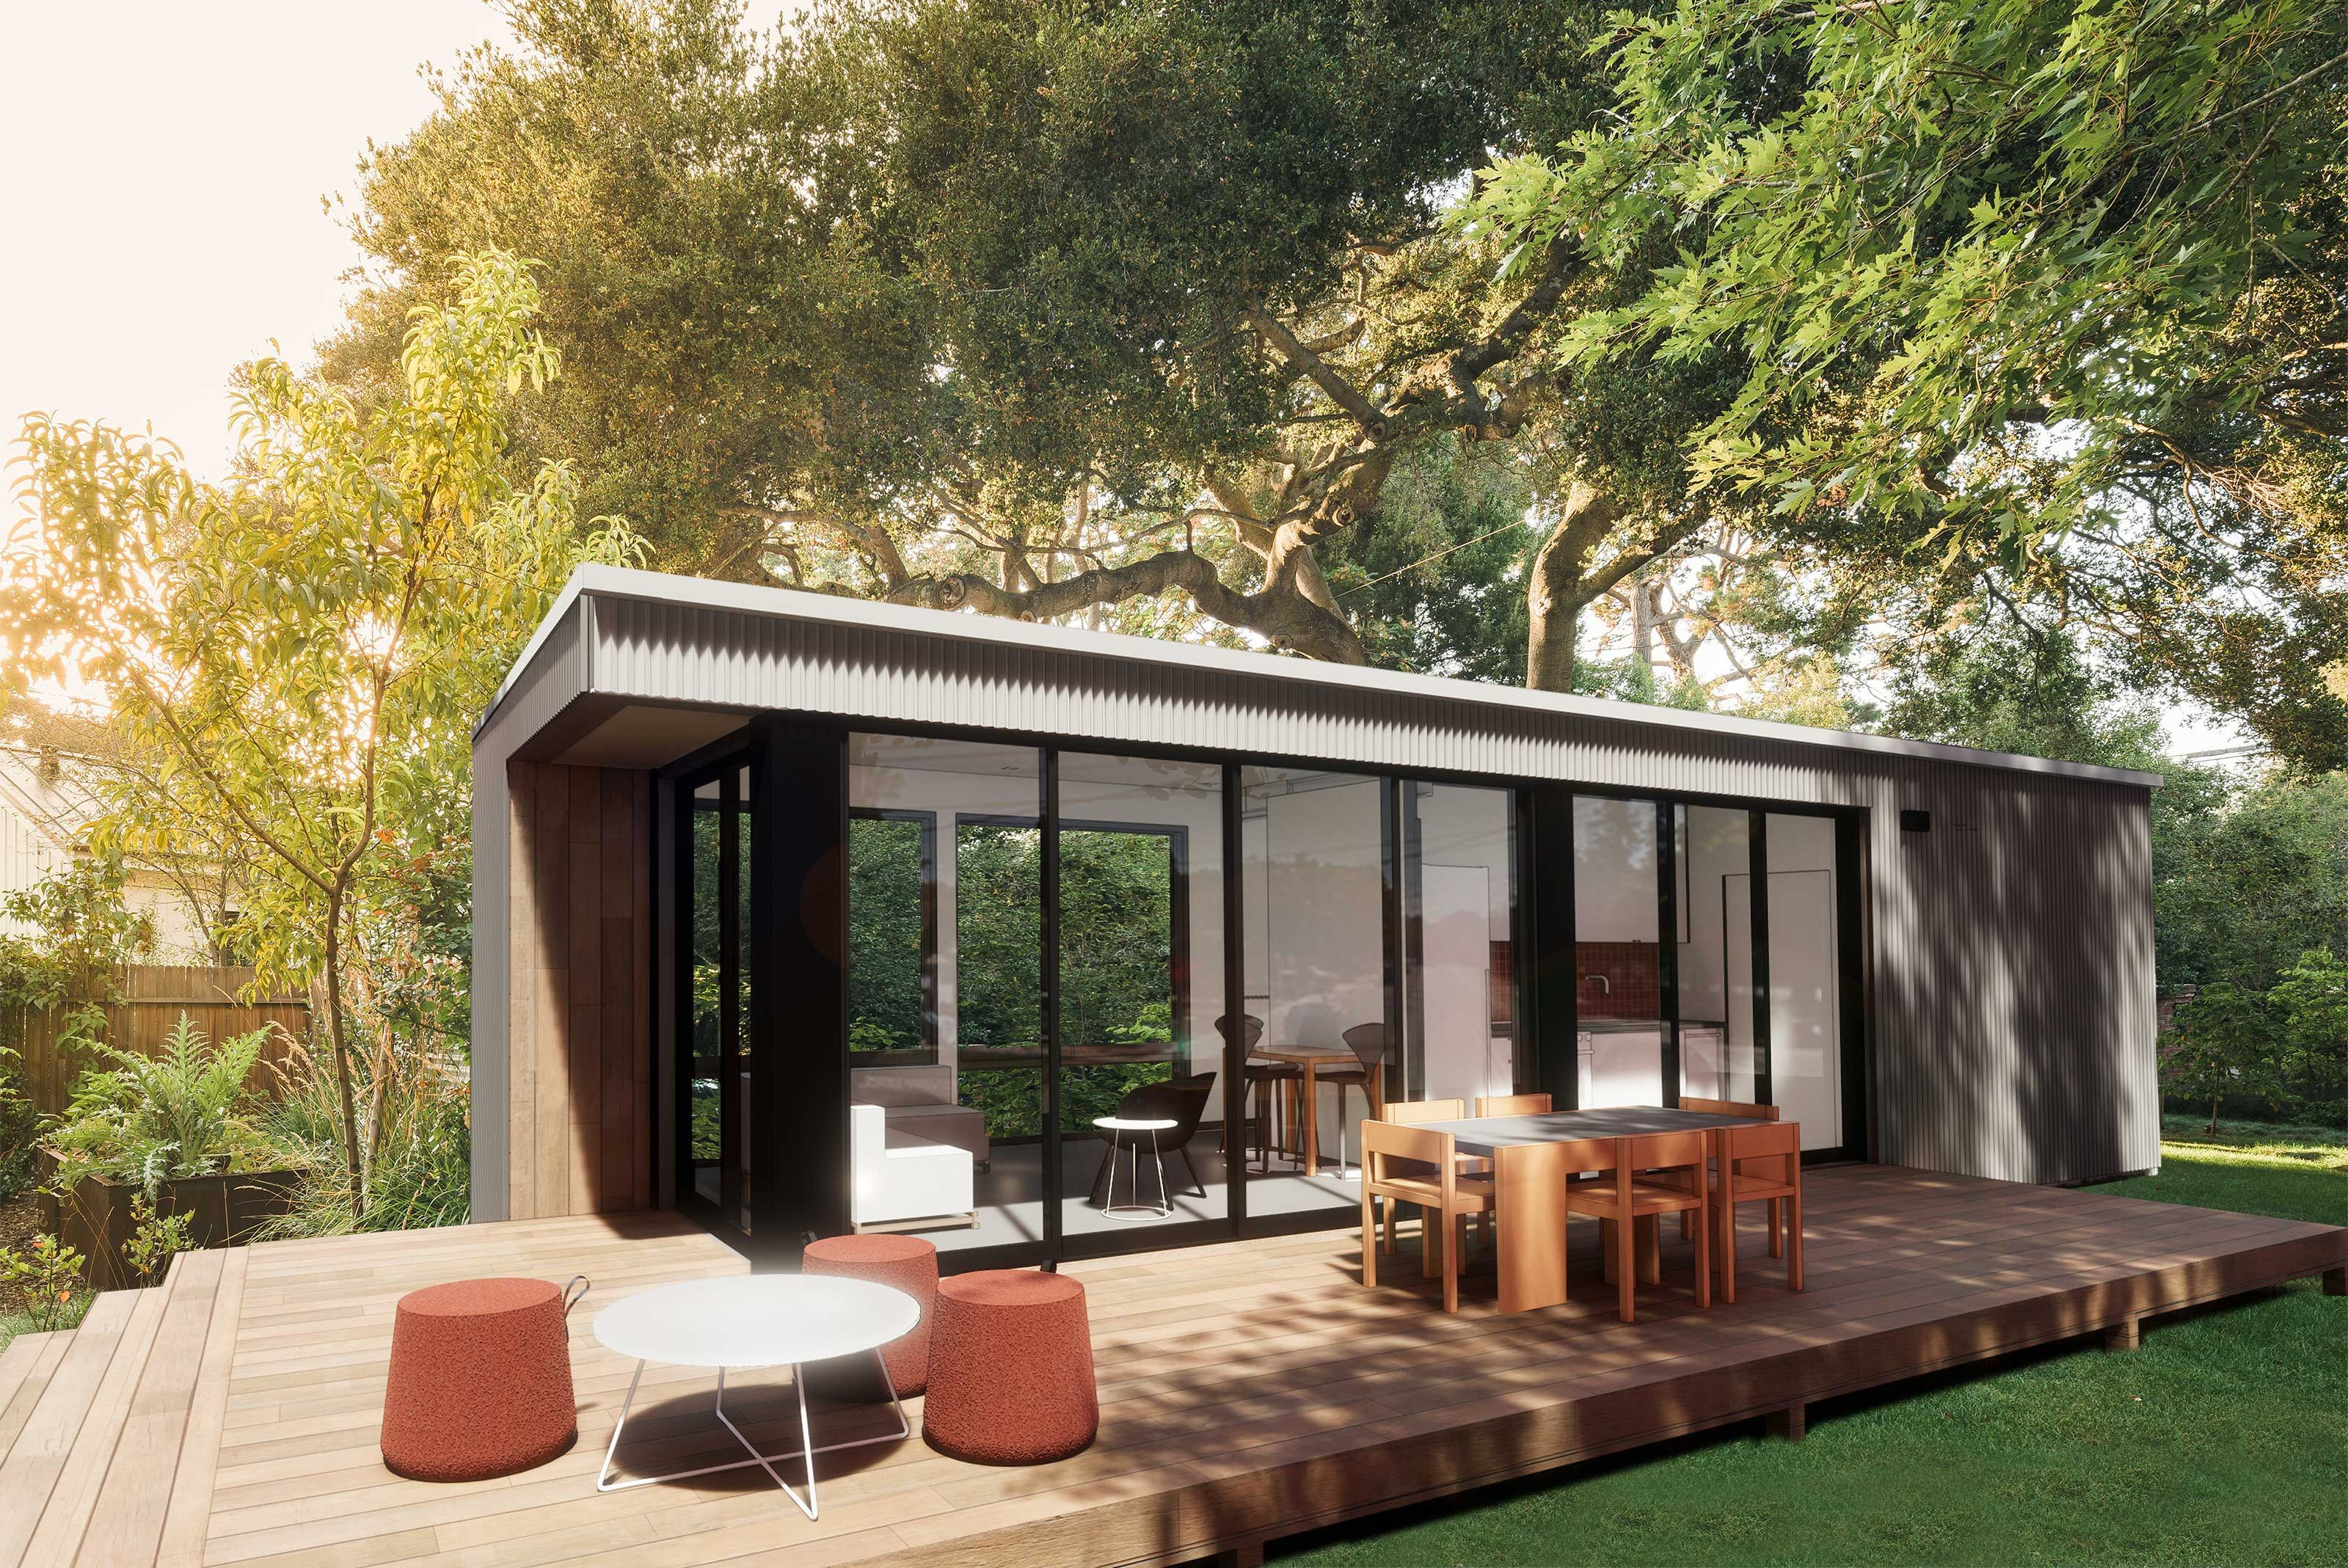 Connect 2 The Perfect Adu Grannyflat Or Guesthouse Housing Solution 460sq Ft 1br 1ba Modern Prefab Homes Prefab Homes Prefab